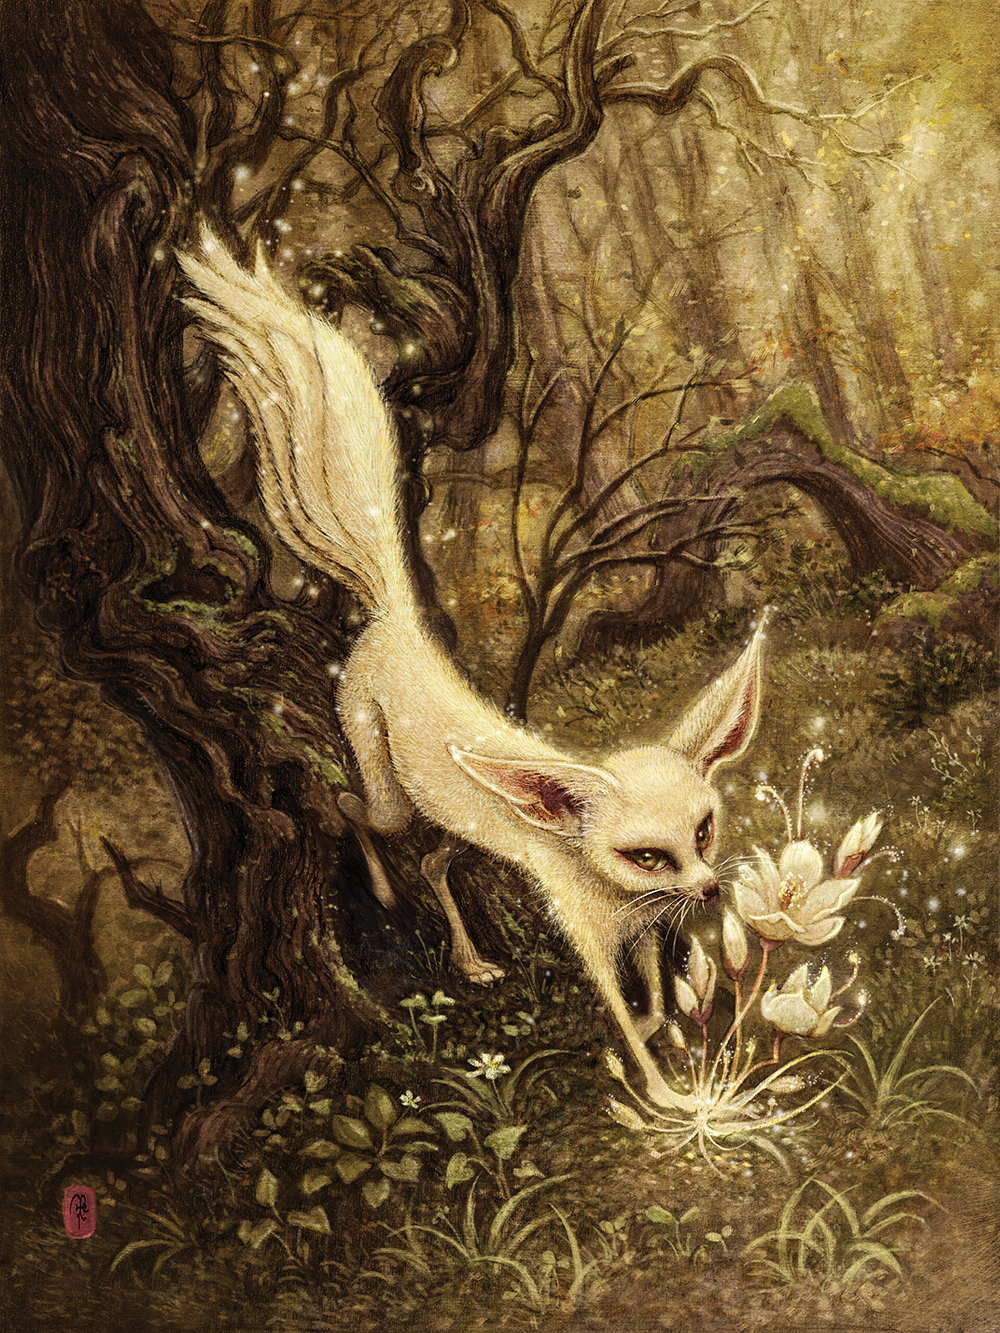 """Foxtuna"" by Phoenix Chan"